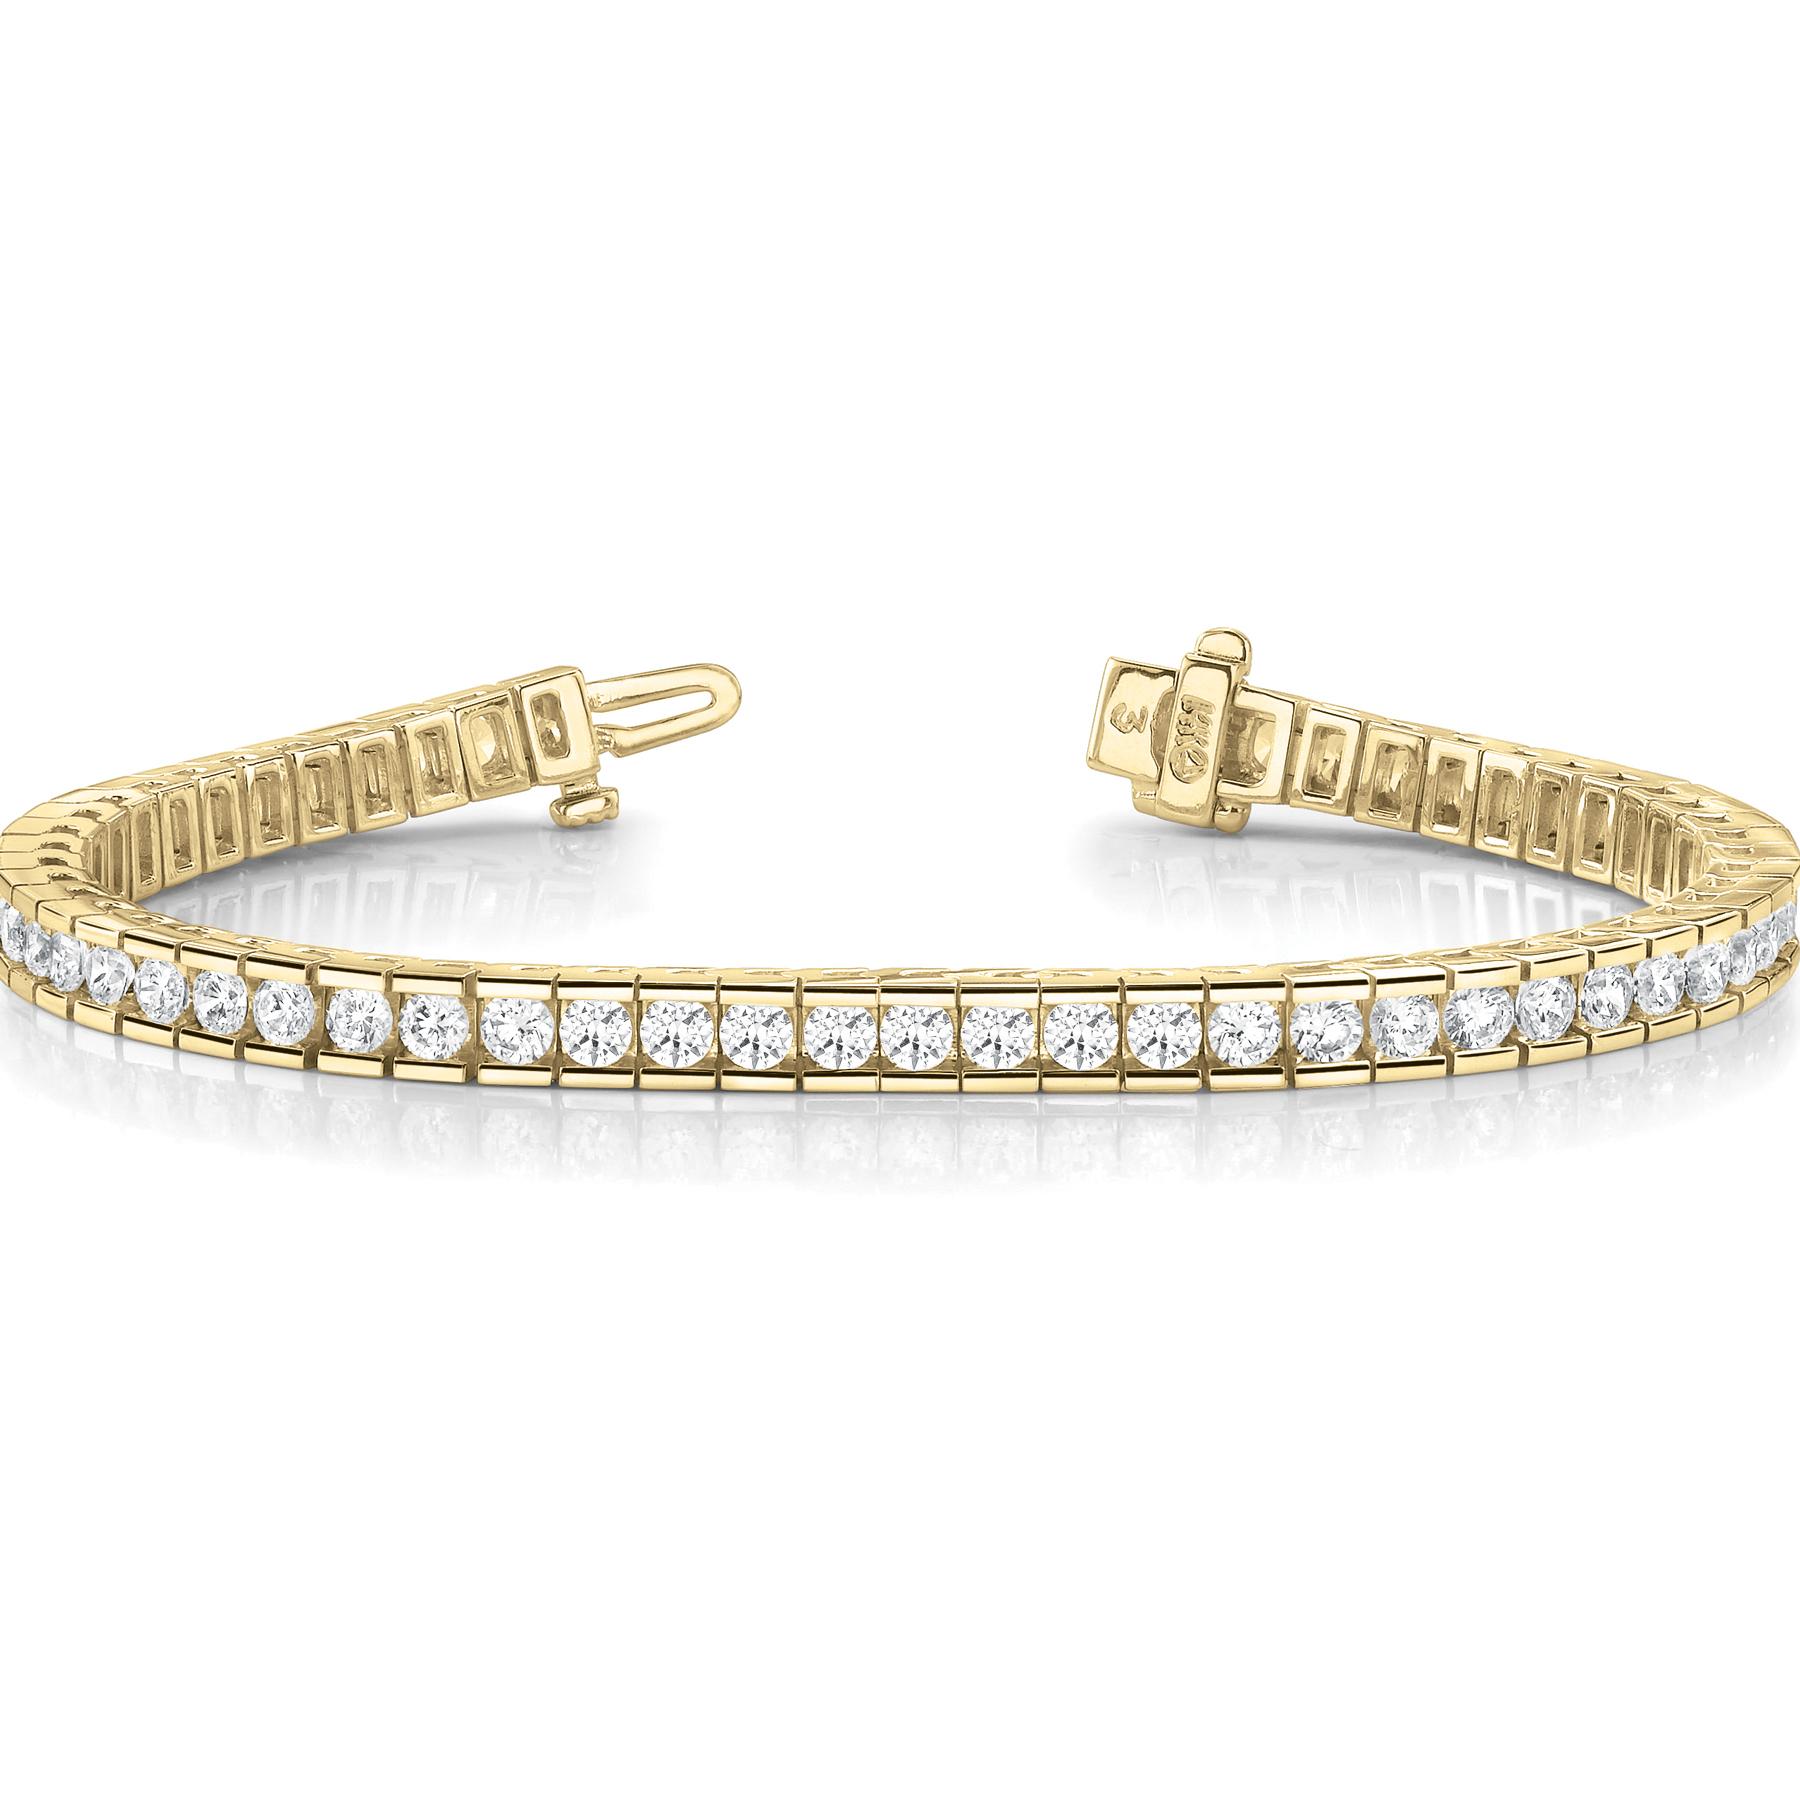 18k-yellow-gold-channel-set-tennis-diamond-bracelet-4489-10-05